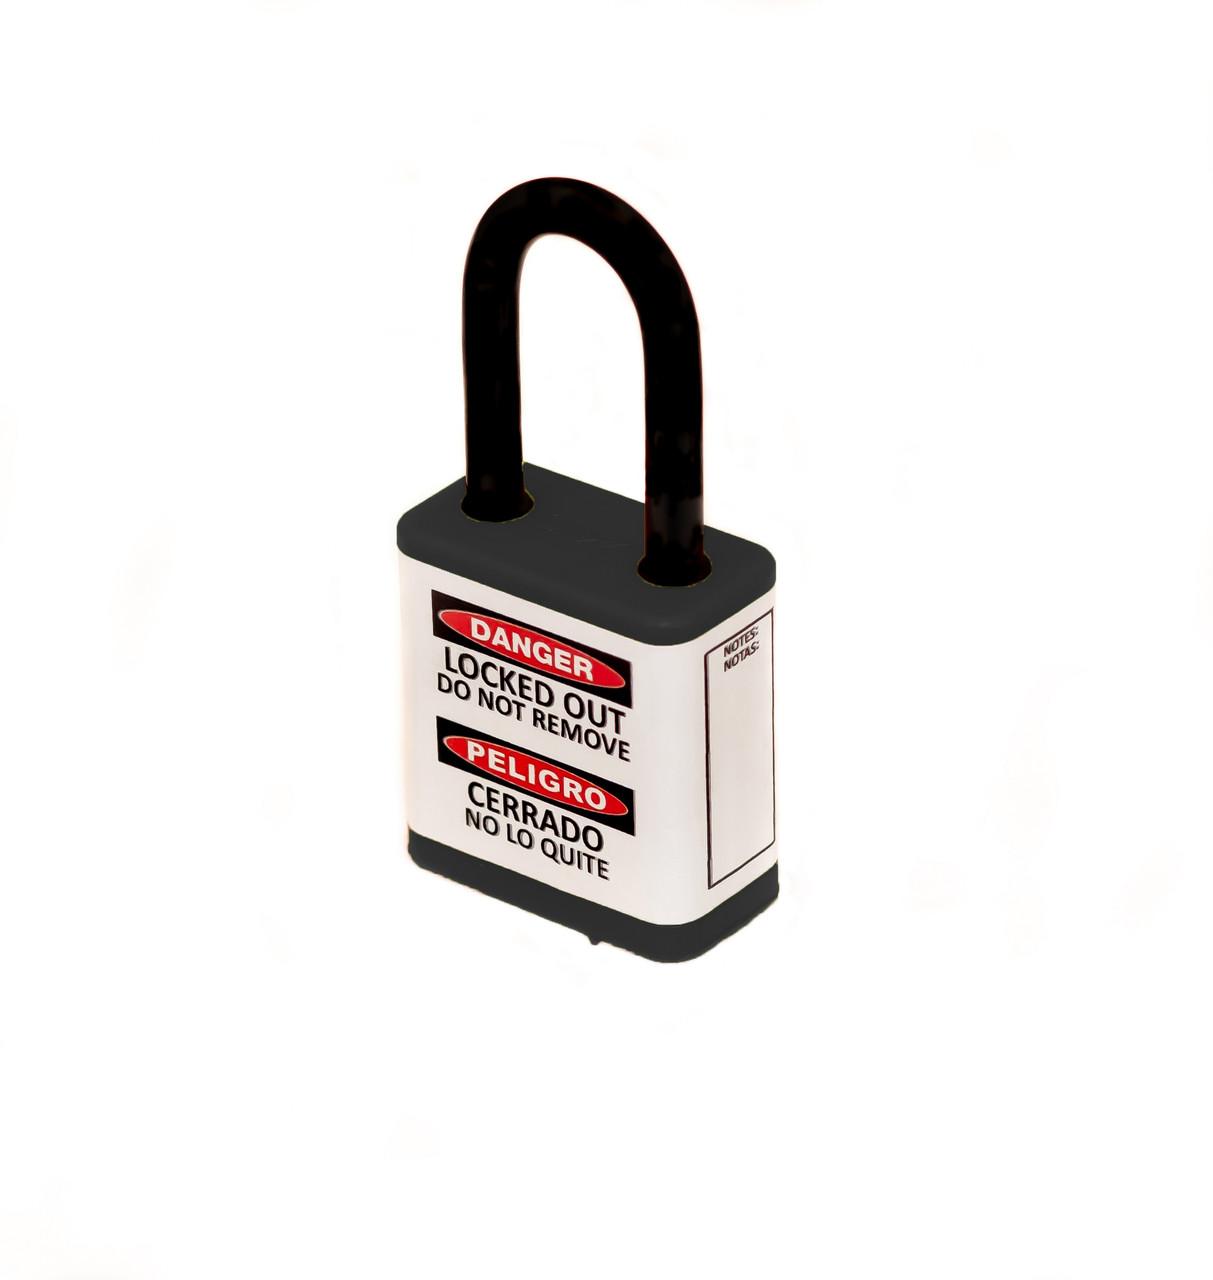 "Lockout Safety Padlock, 700 Series, 1.5"" Shackle, Keyed Different, Black"